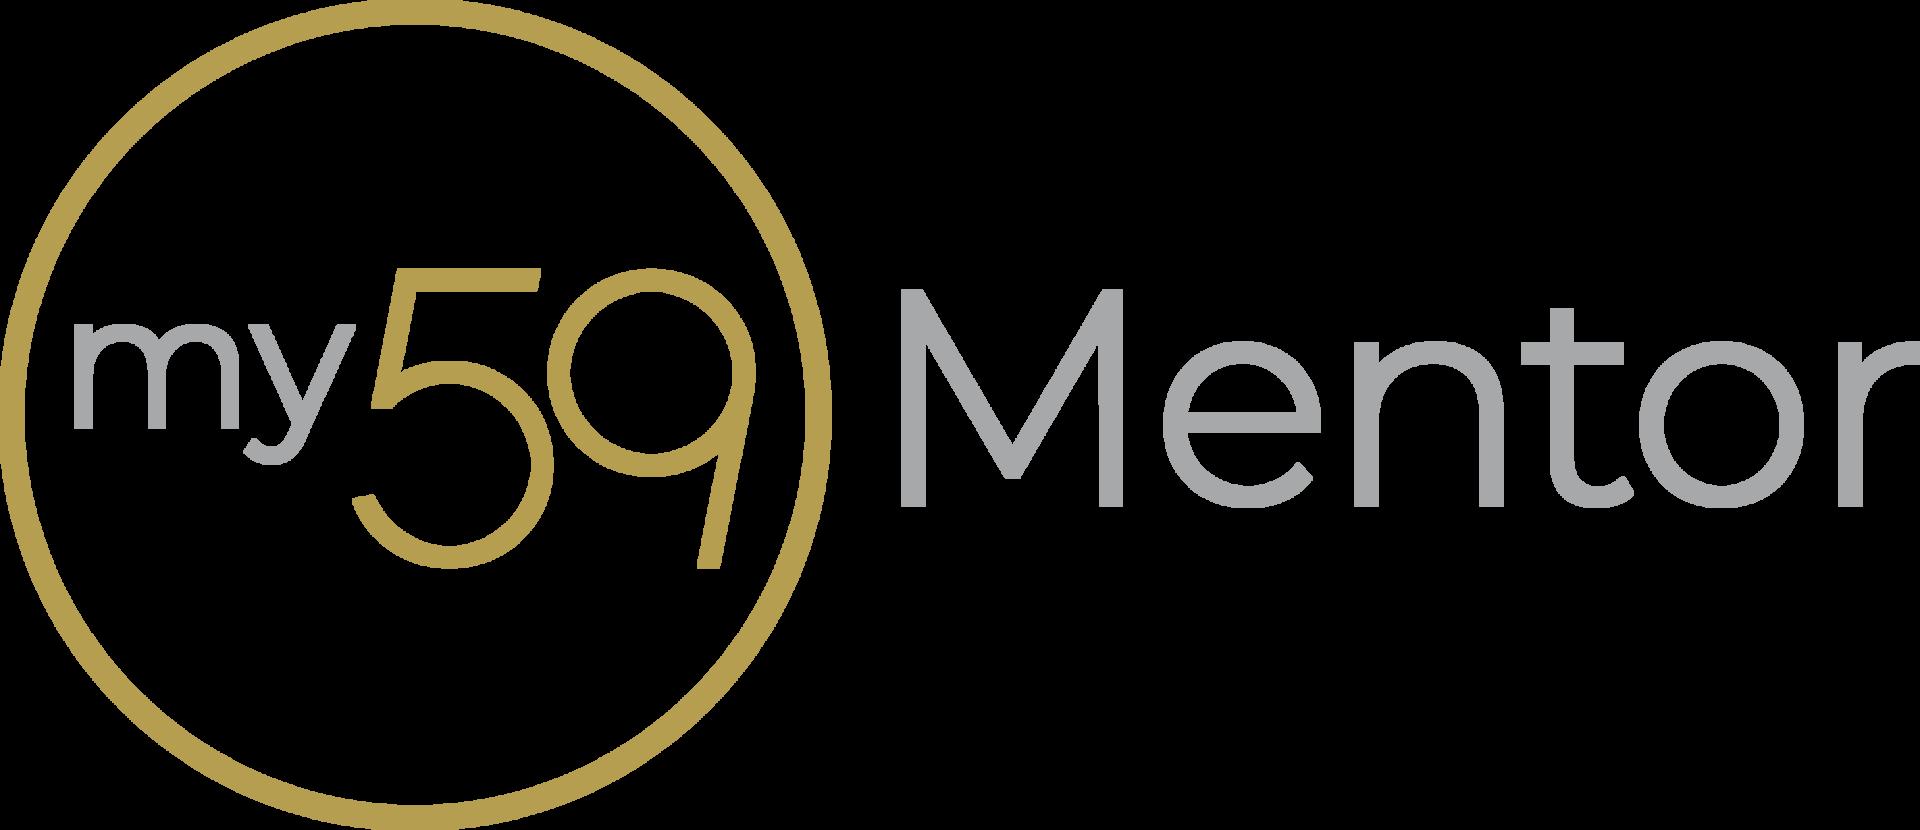 My59Mentor Learning Platform